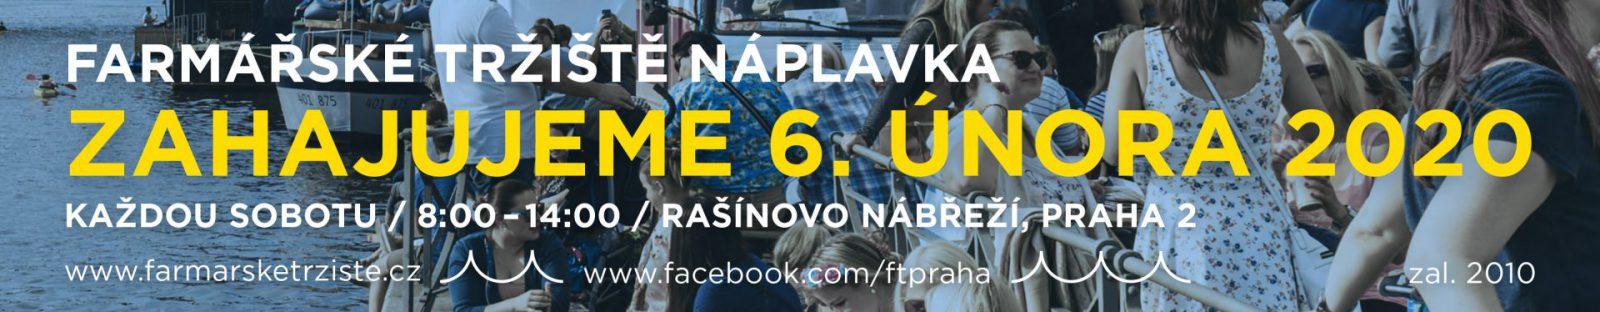 https://www.farmarsketrziste.cz/wp-content/uploads/naplavka-2021-web-770x150-v1-1.jpg